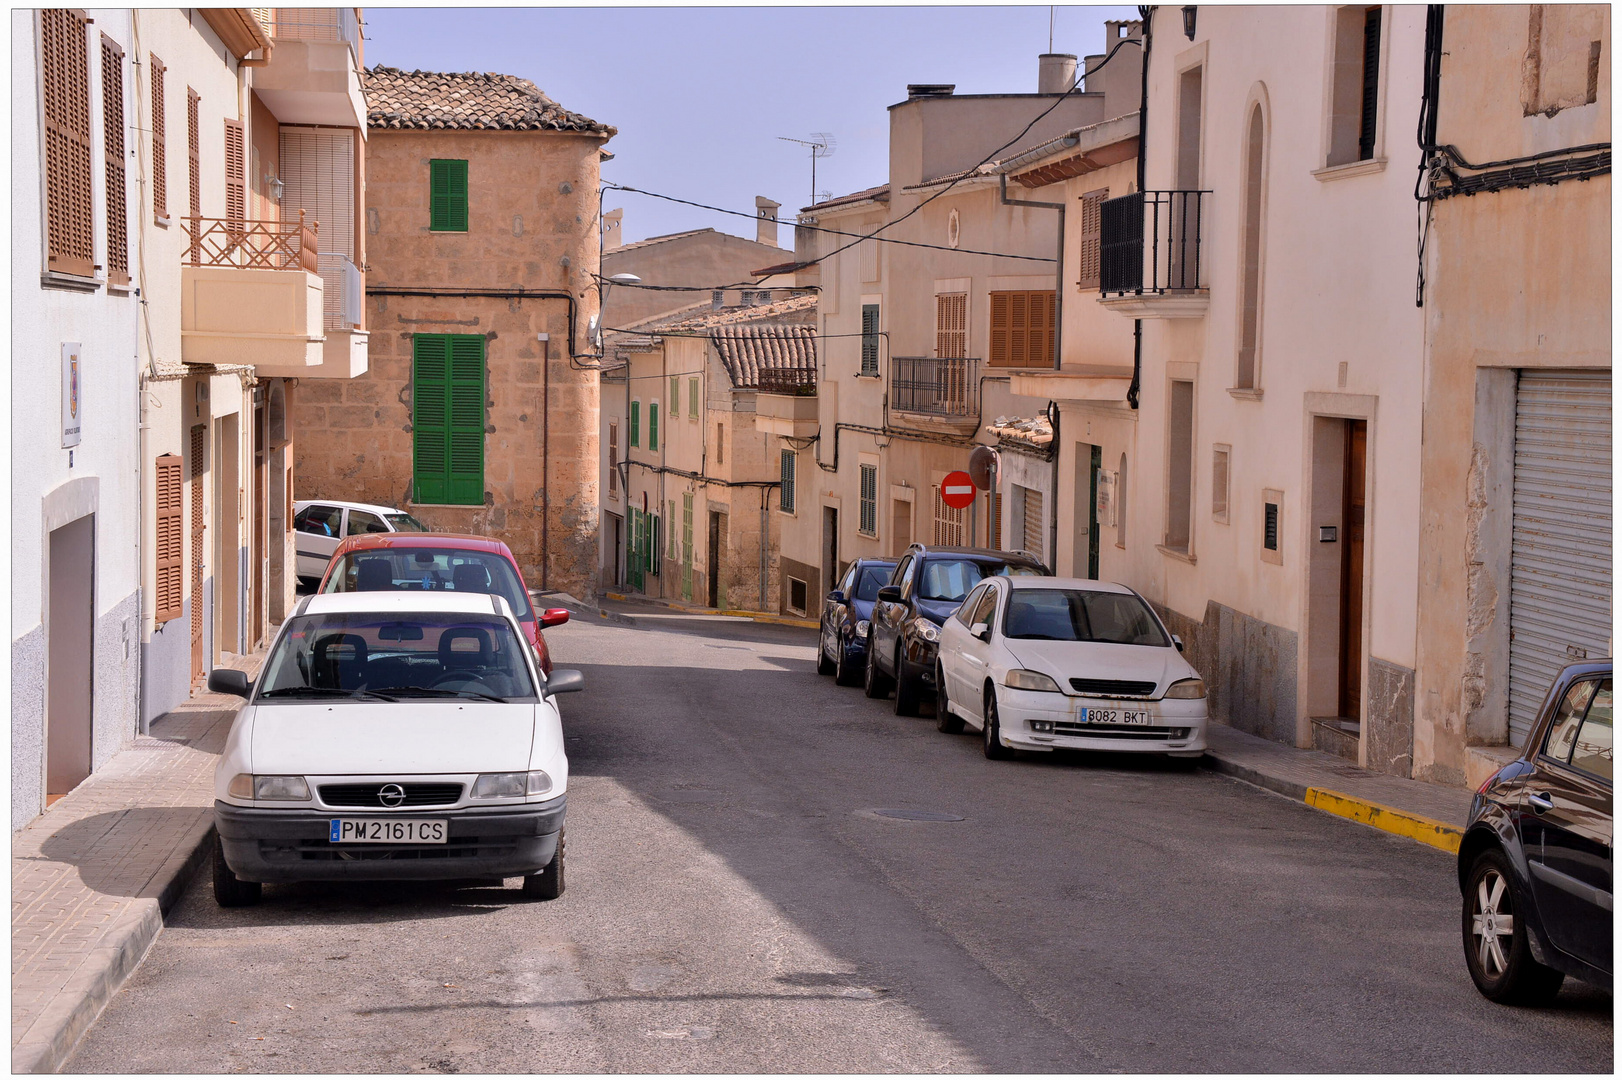 Mallorca 2012, calle en Santa Margalida